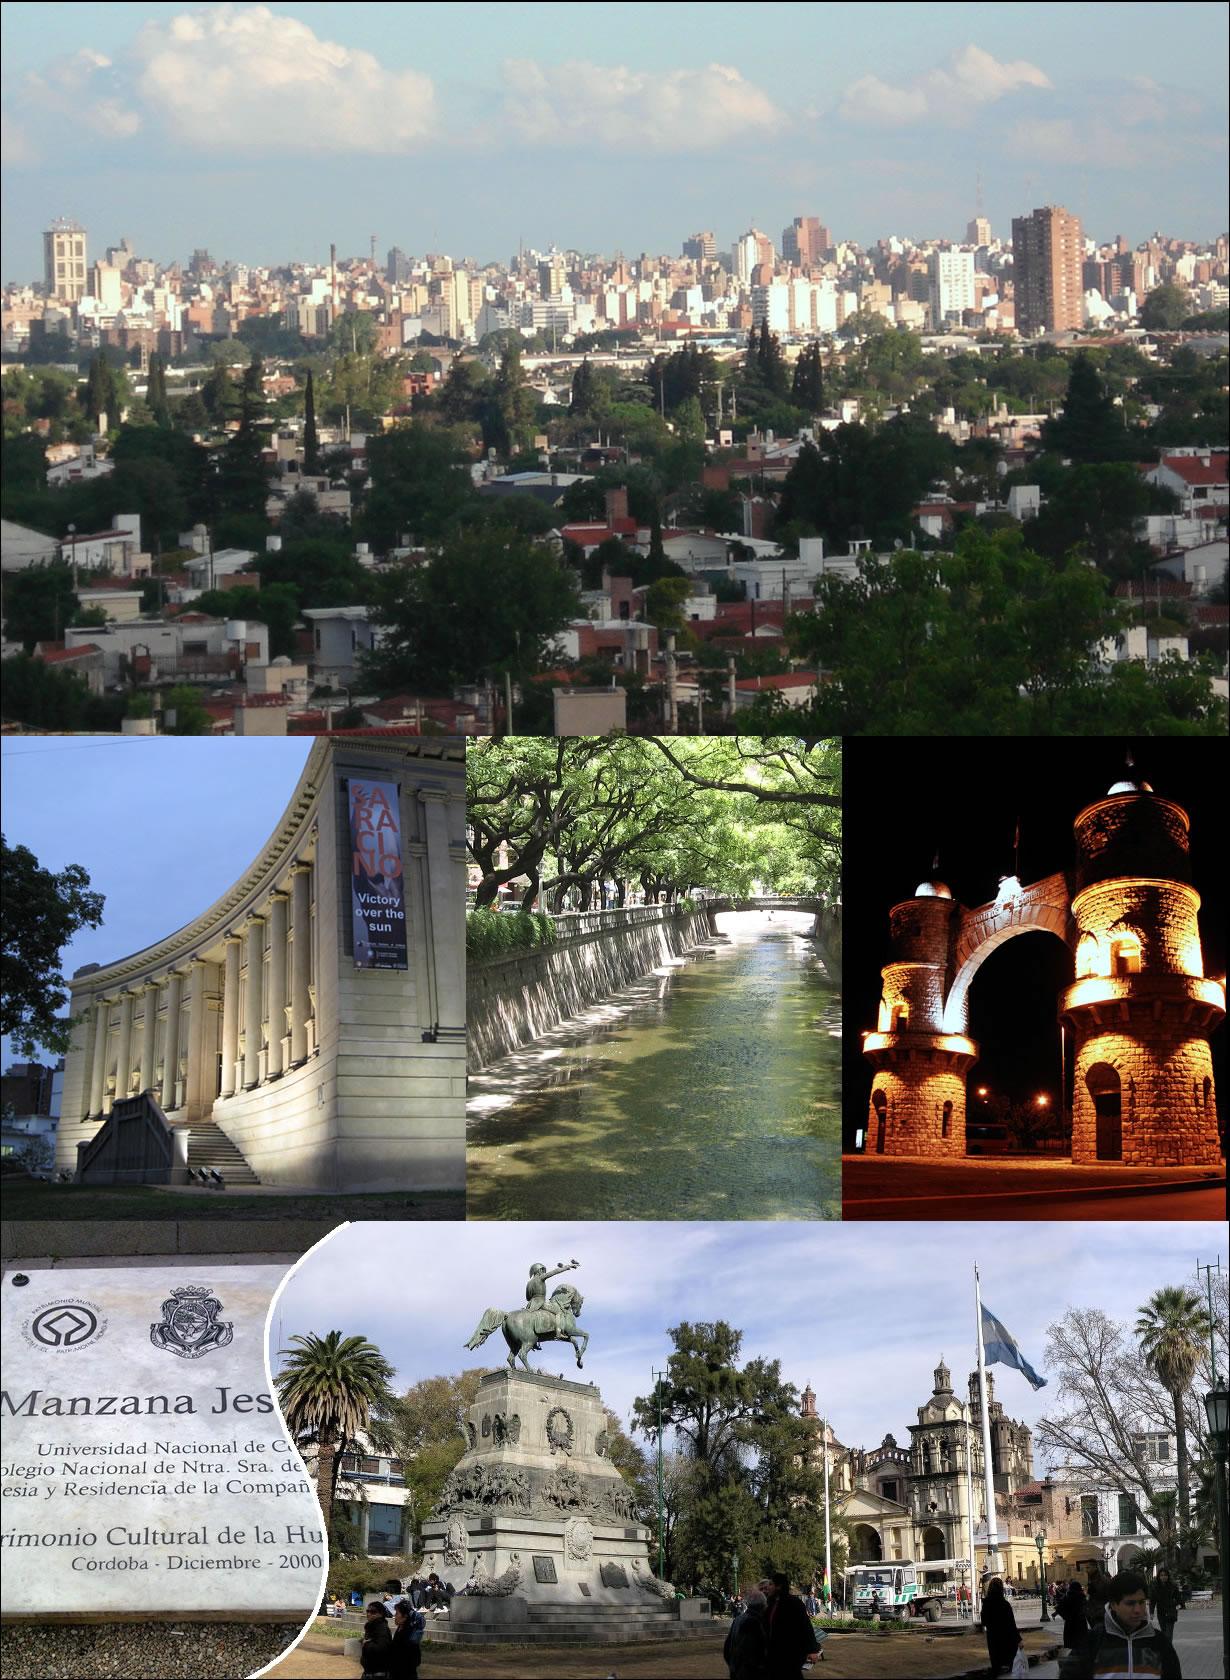 ciudades importantes de Argentina